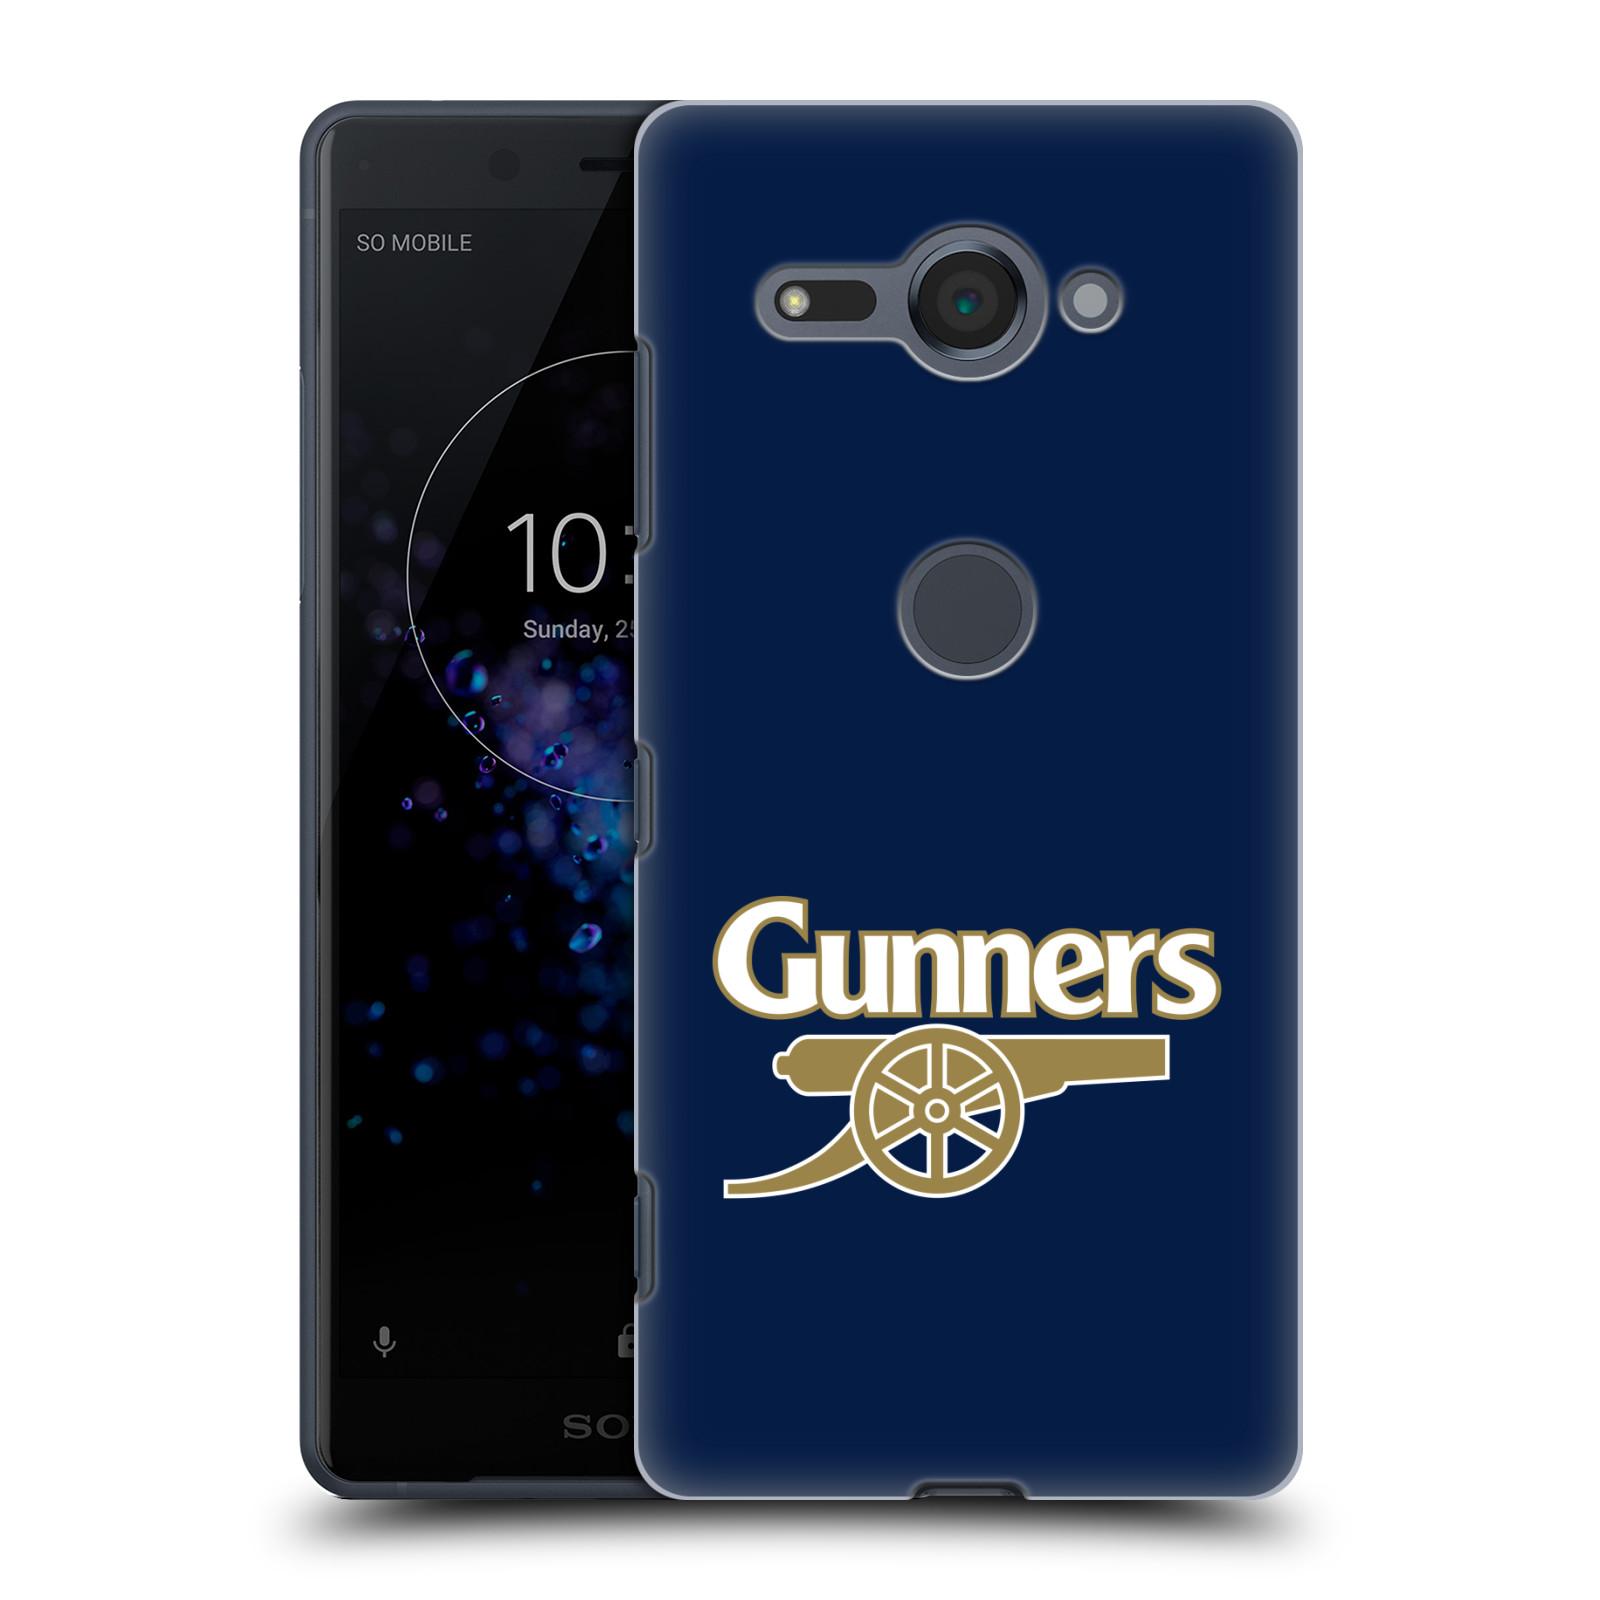 Plastové pouzdro na mobil Sony Xperia XZ2 Compact - Head Case - Arsenal FC - Gunners